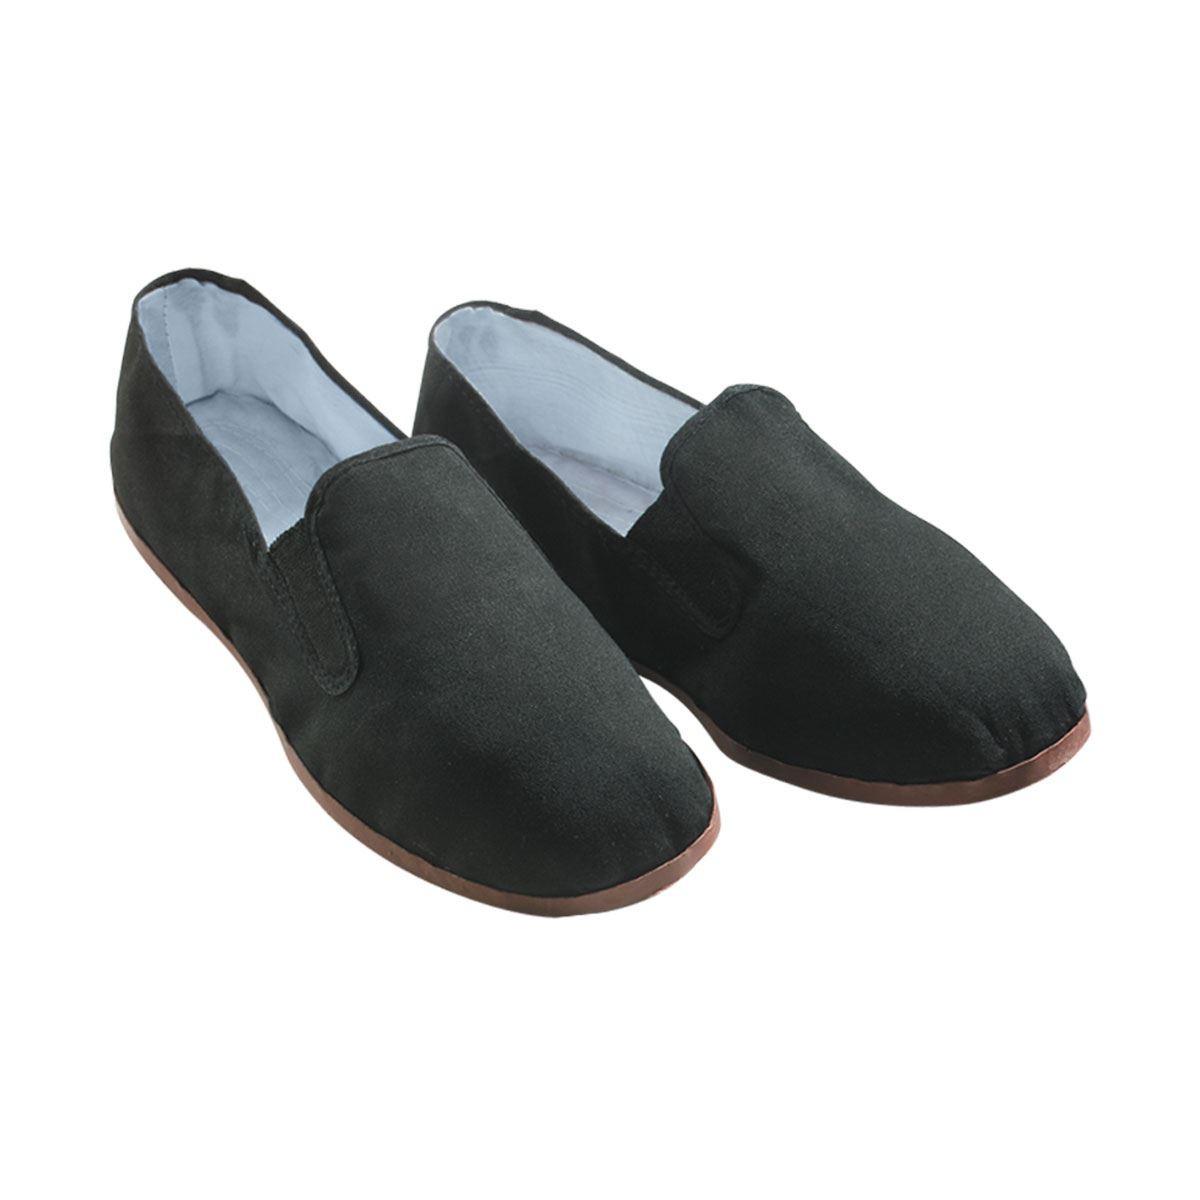 Century Martial Arts Rubber Sole Kung Fu Shoe